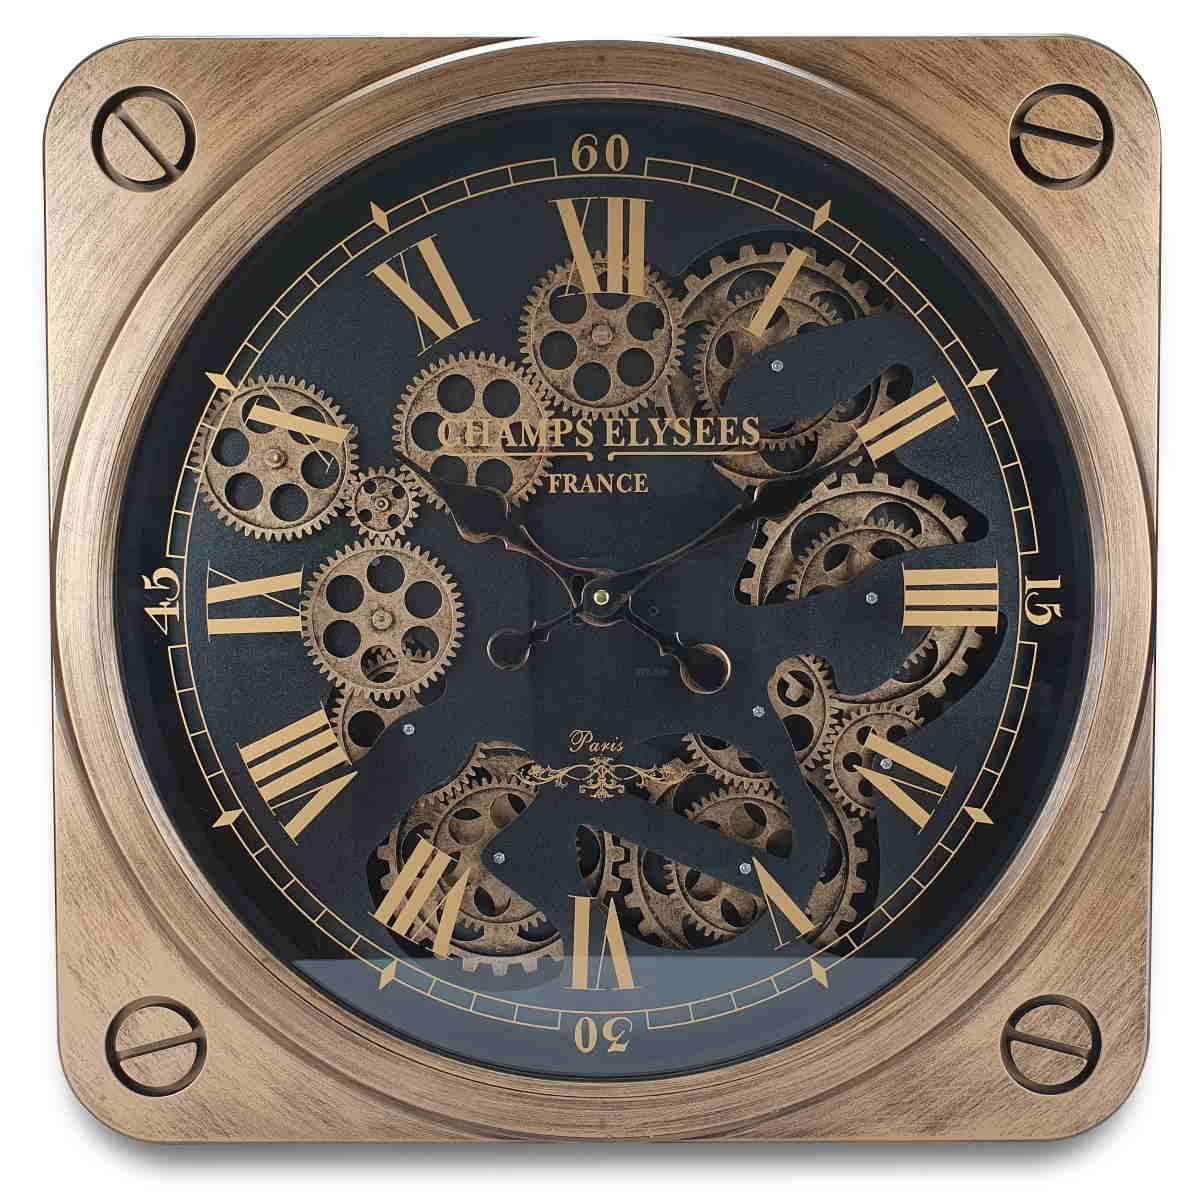 ساعت ديواري شانزه ليزه مدل 17033A